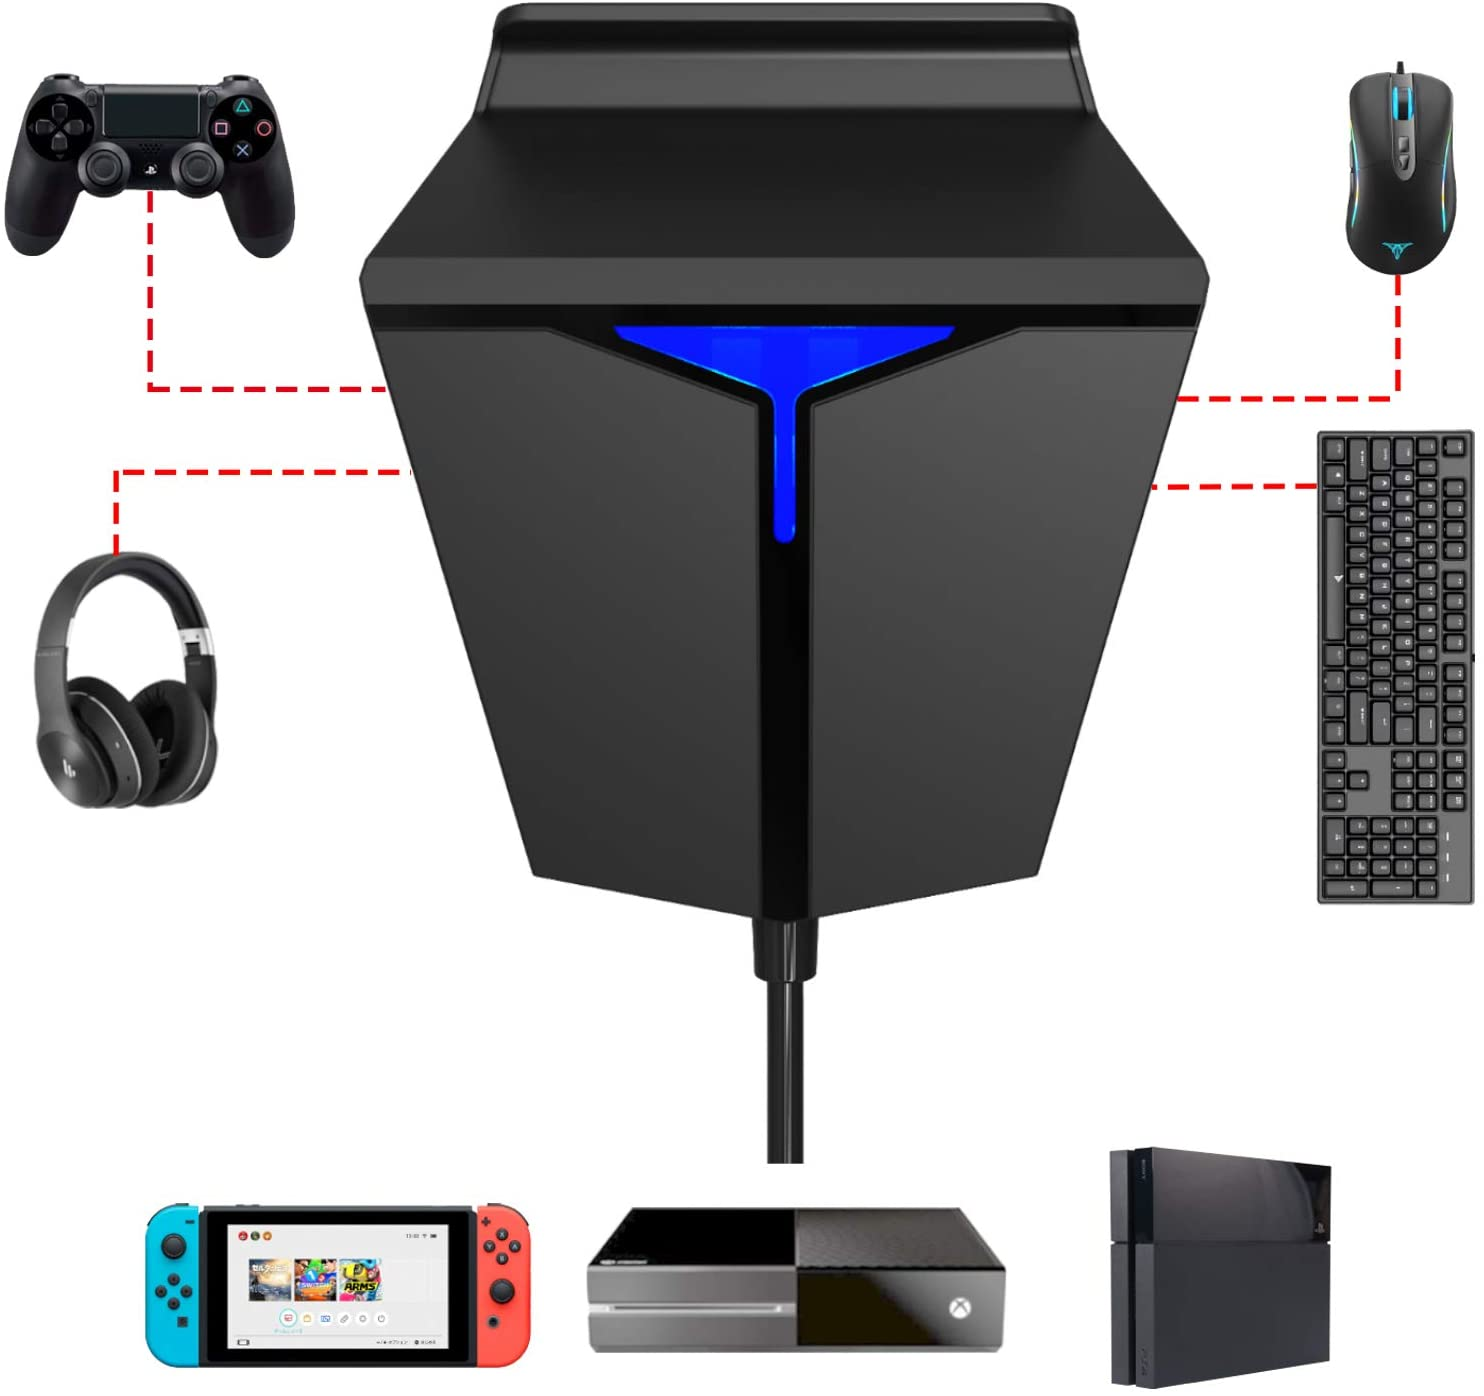 IFYOO-محول لوحة المفاتيح والماوس ، لجهاز PS4/XBOX ONE/Nintendo Switch ، وحدة التحكم ، متوافق مع الدردشة الصوتية لـ Fortnitee/PUBG/Call of duty